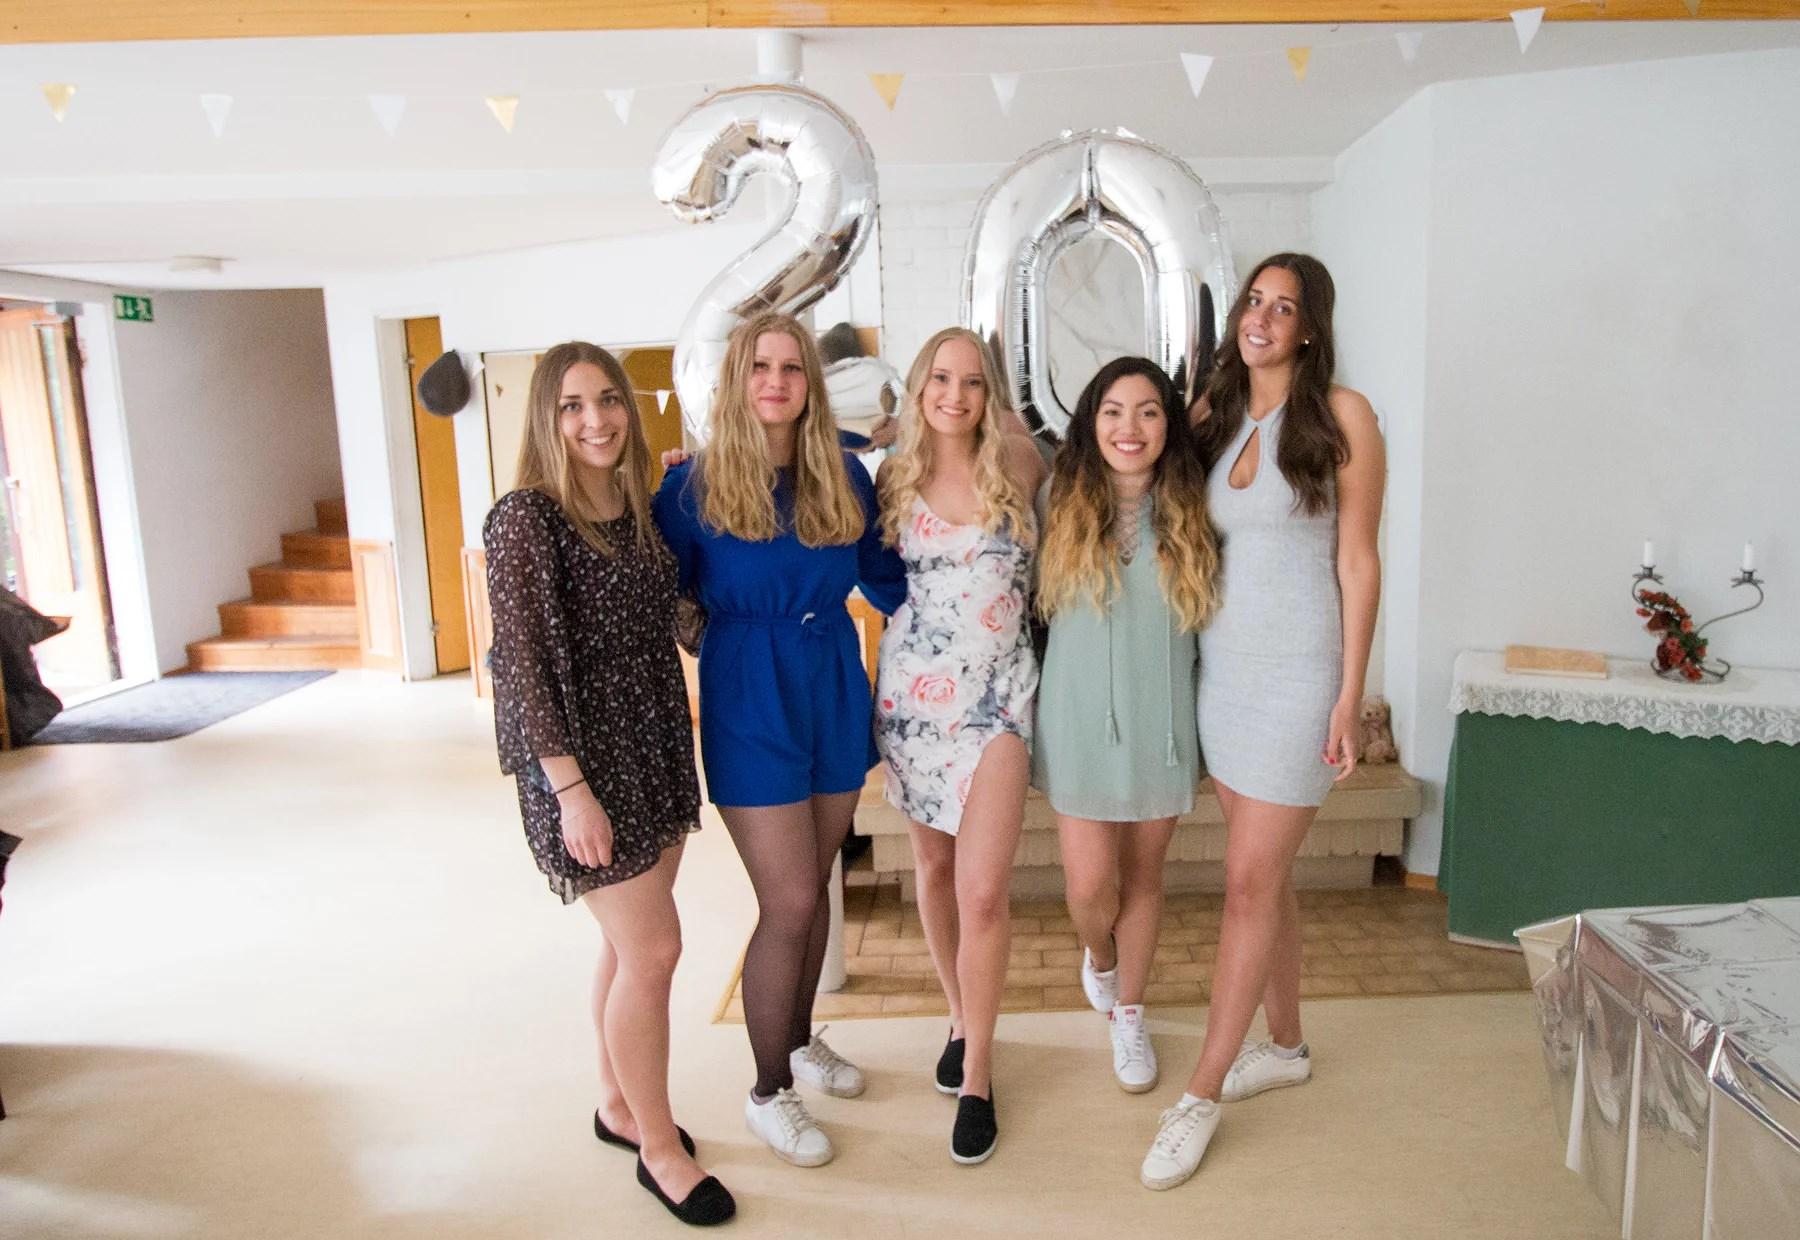 20-årsfest